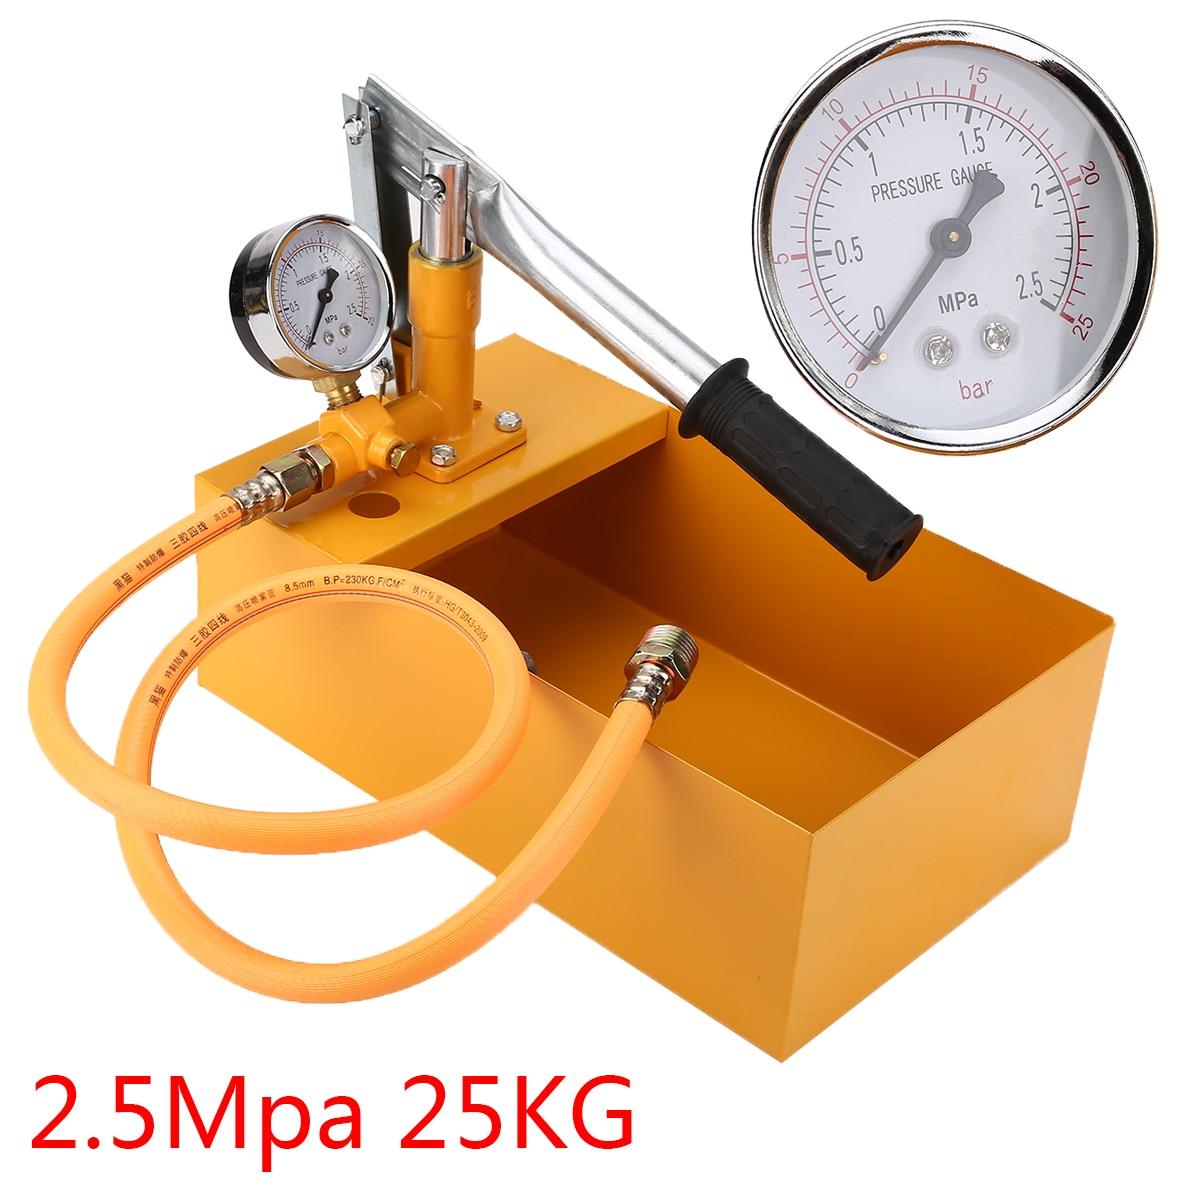 1 Set Pipeline Tester Pump Measuring Tool 25KG Manual Hydraulic Water Pressure Test Pump Machine with Screws Nuts Accessories